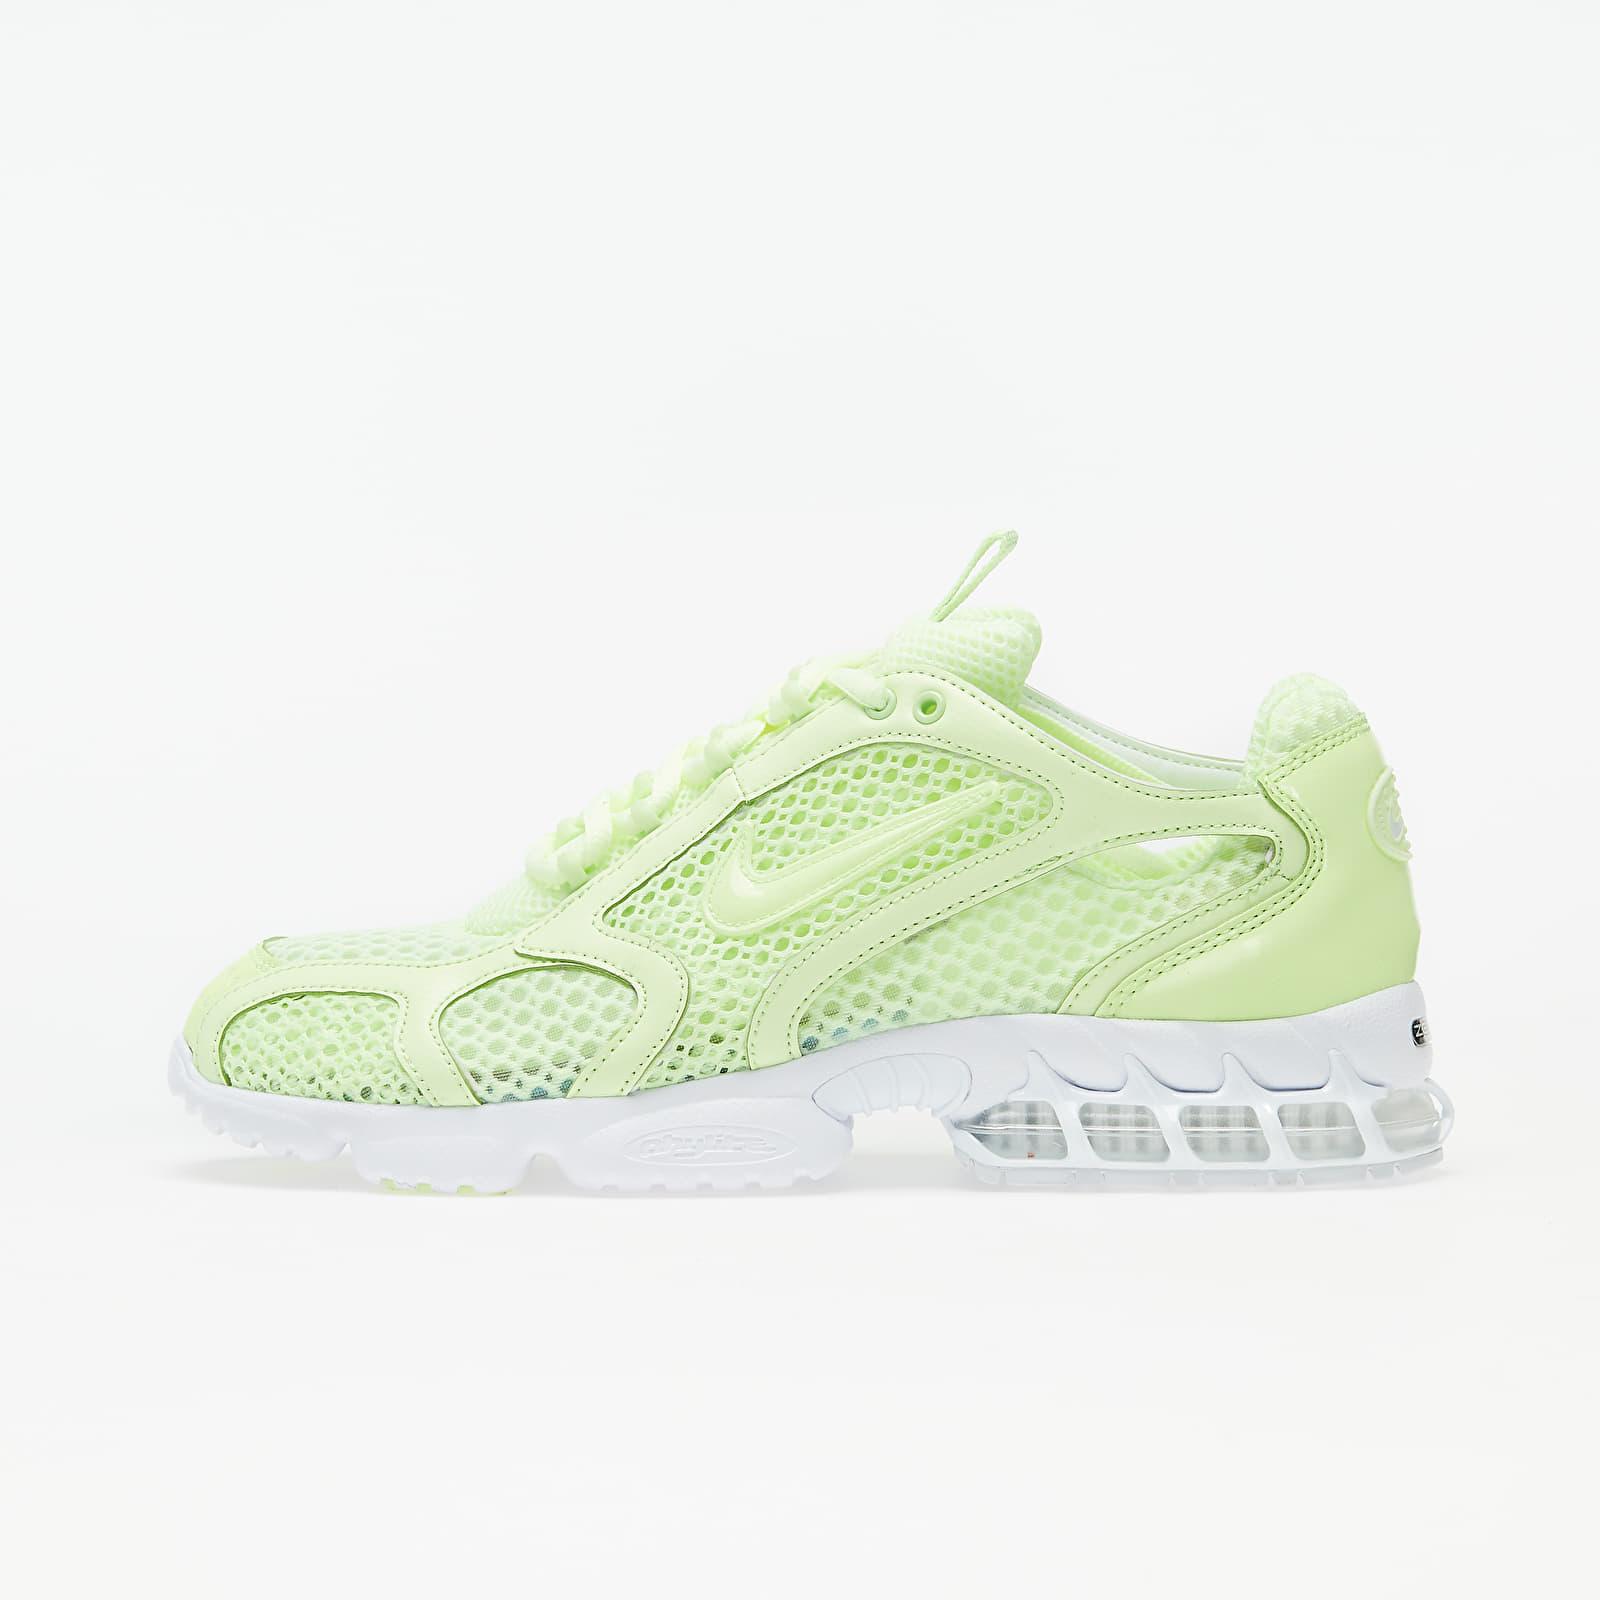 Nike Air Zoom Spiridon Cage 2 Barely Volt/ Barely Volt-White-Black CJ1288-700